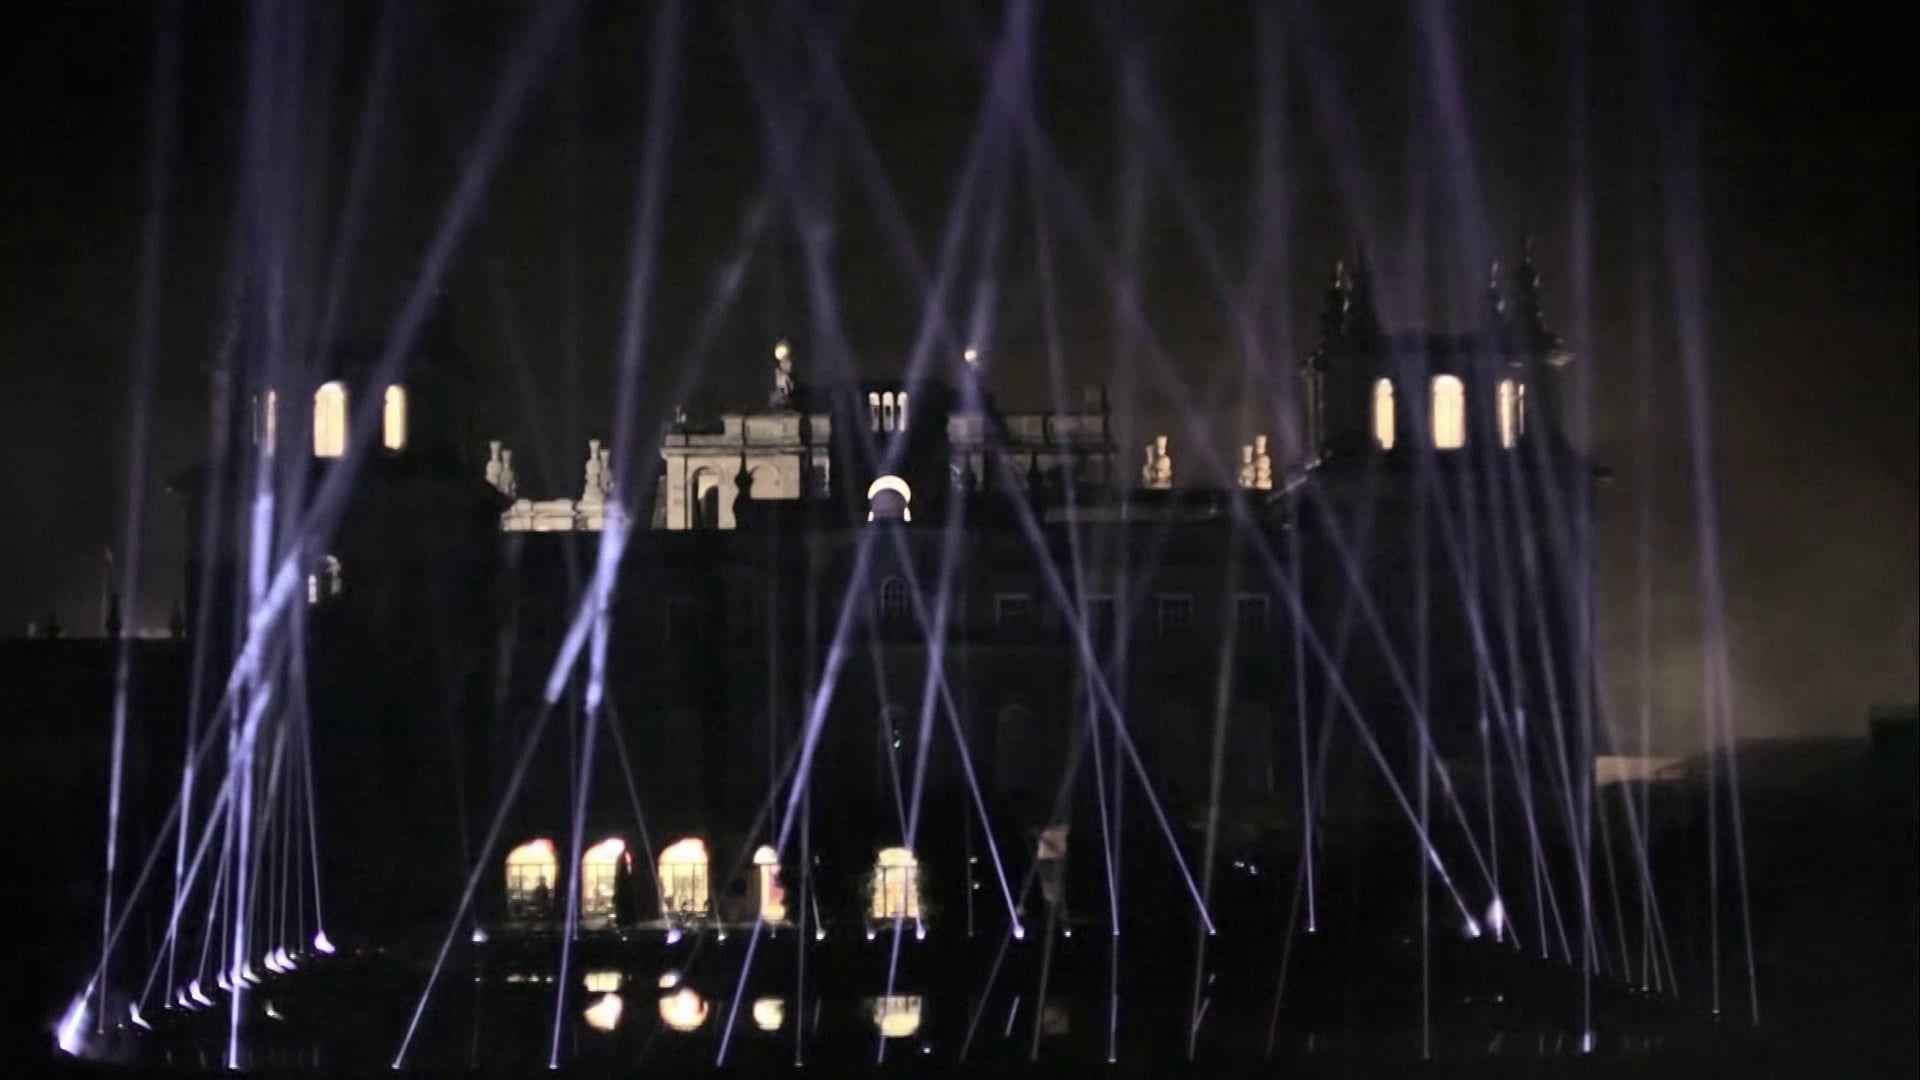 Simple Harmonic Motion 11 At Blenheim Palace